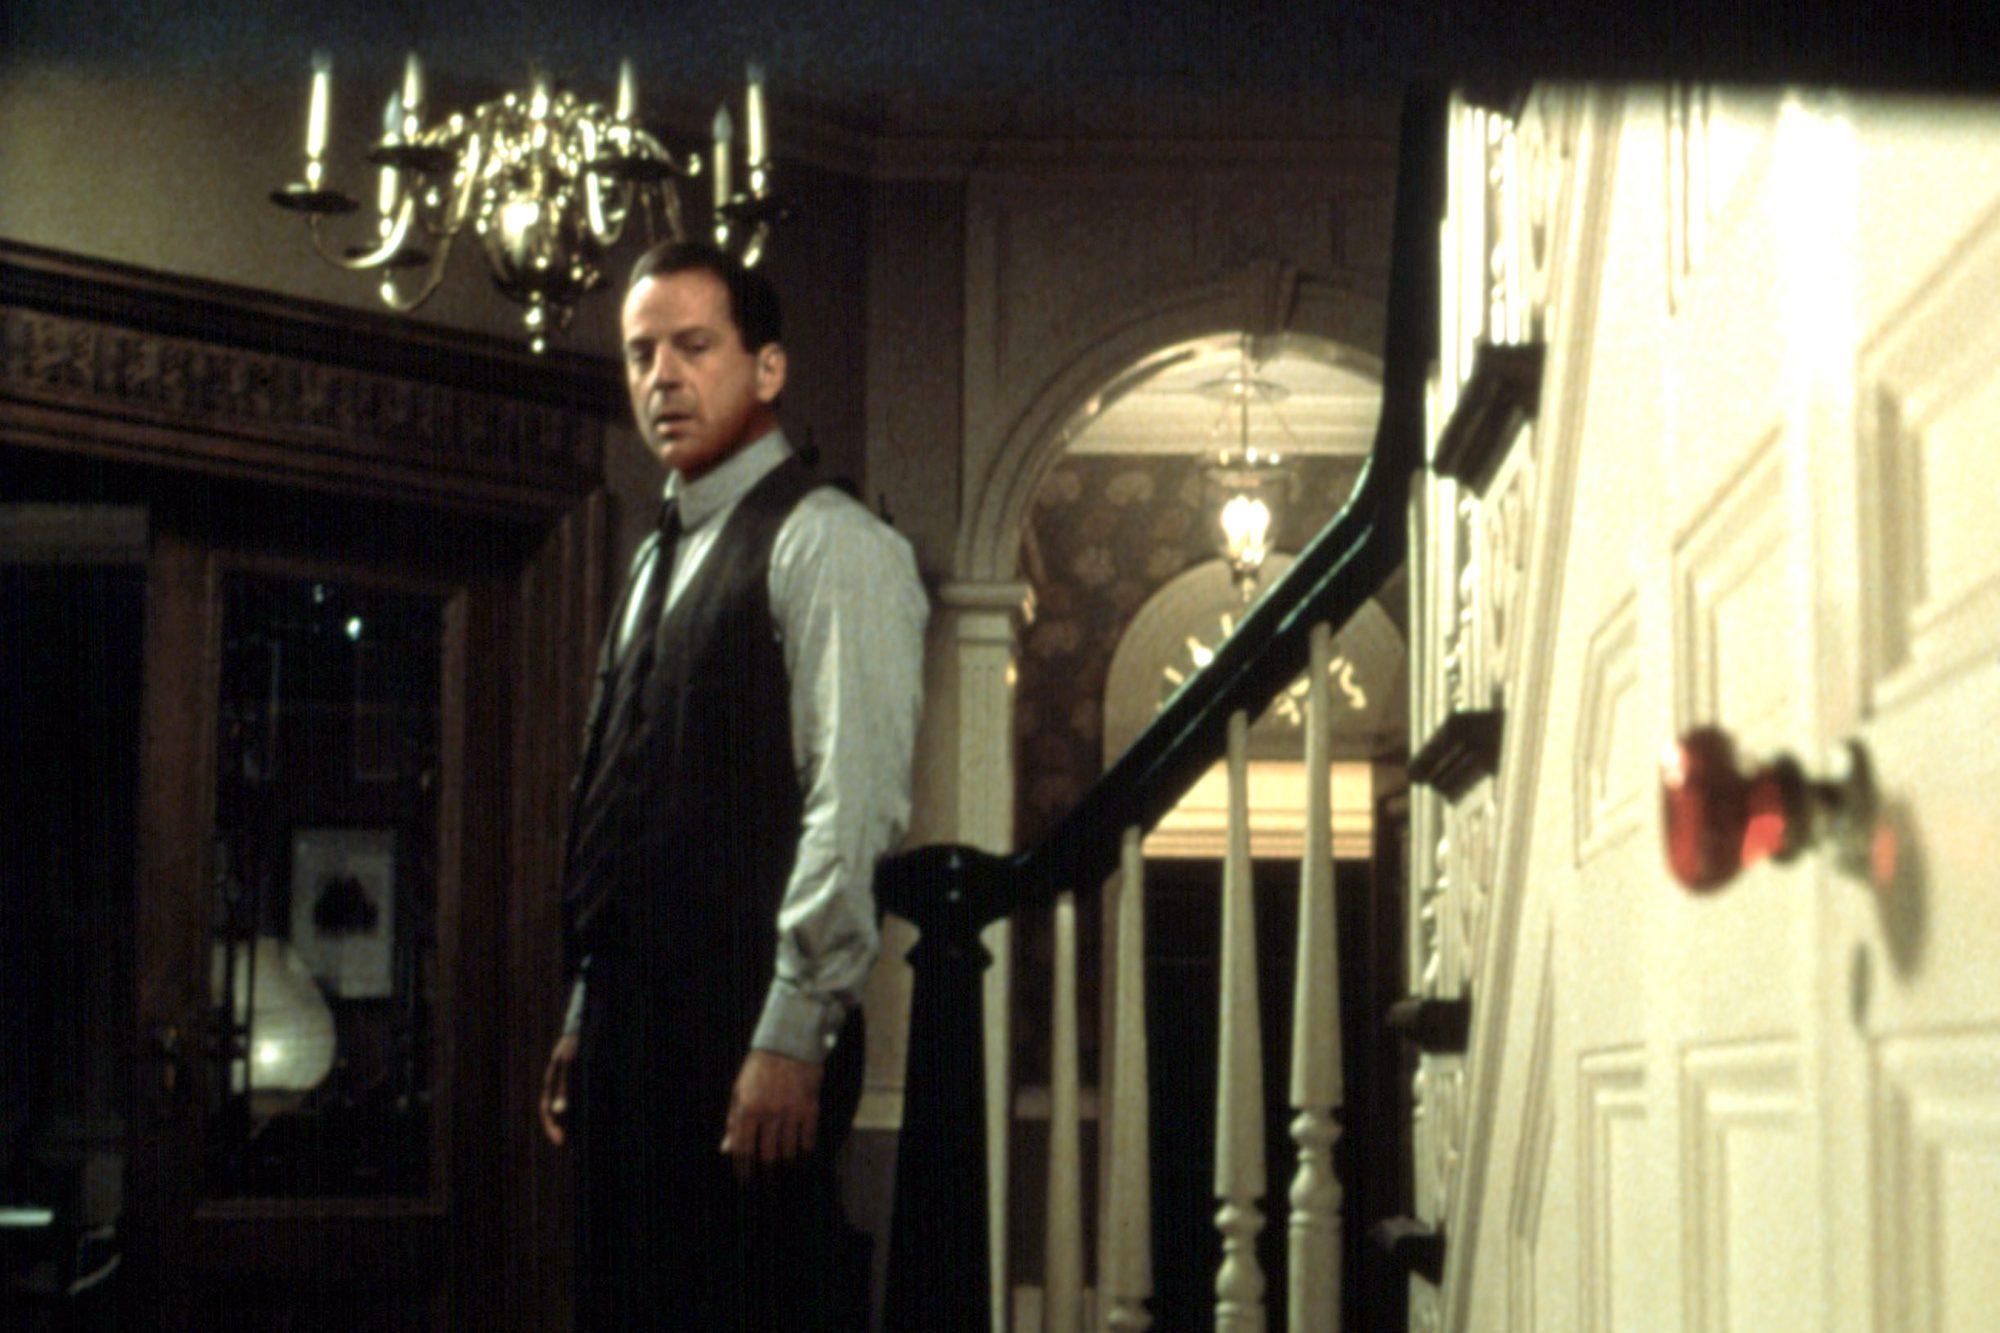 THE SIXTH SENSE, Bruce Willis, 1999, (c) Buena Vista/courtesy Everett Collection